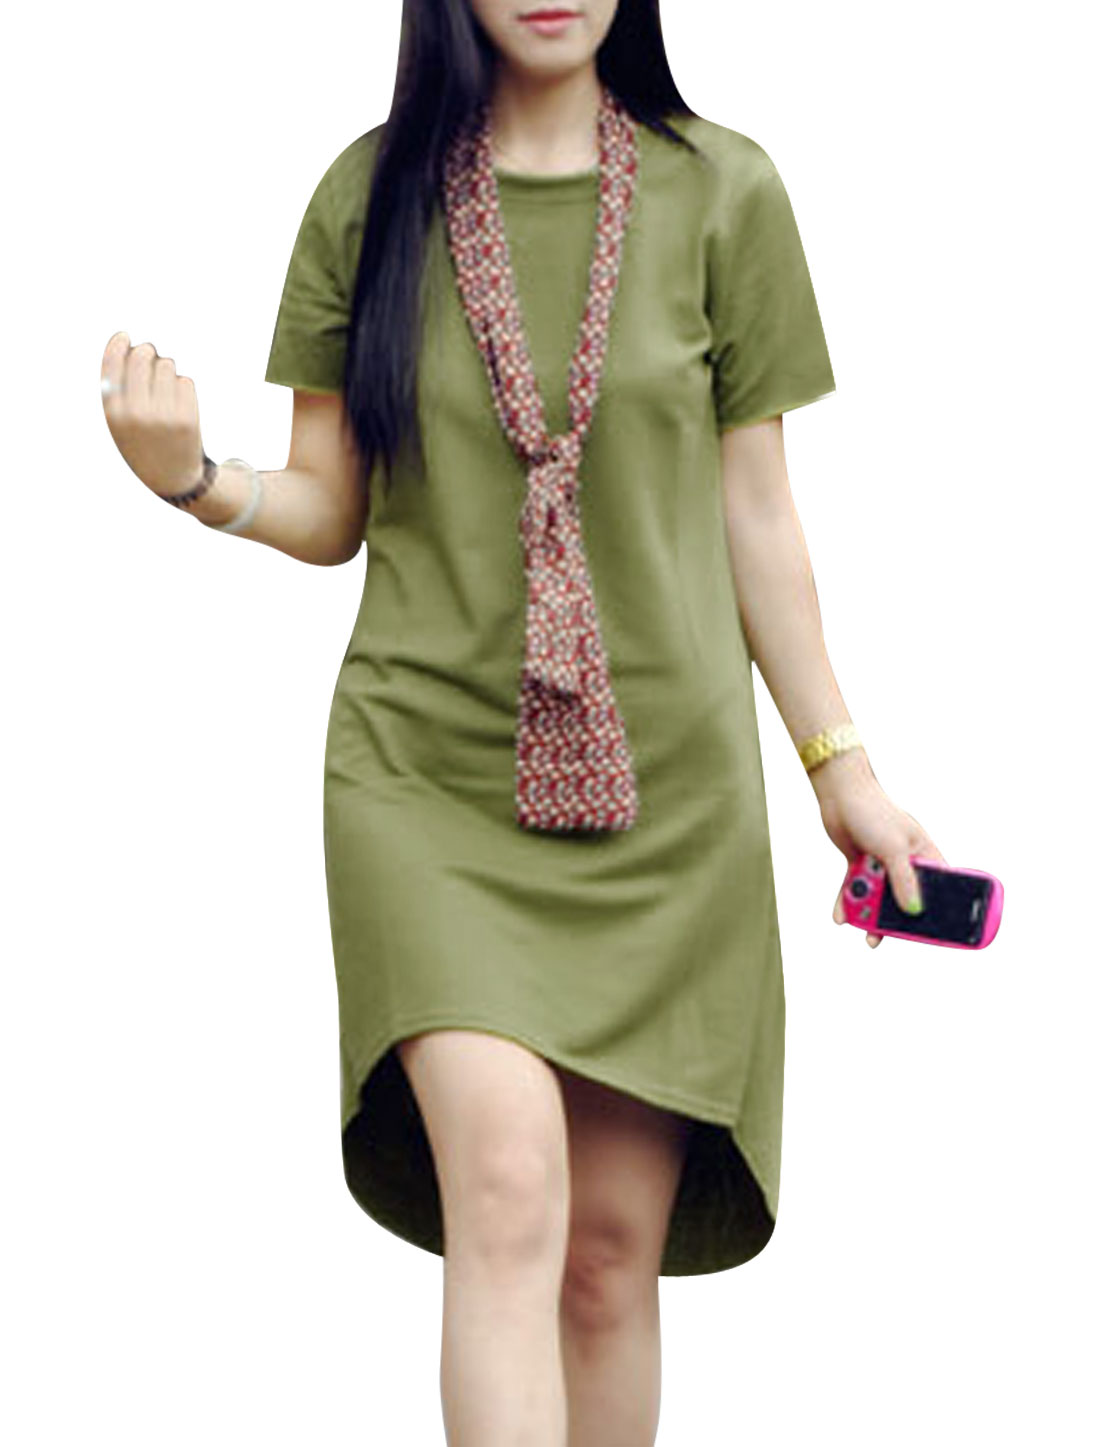 Lady Summer Short Sleeve High Low Hem Dress w Floral Prints Scarf Army Green XS